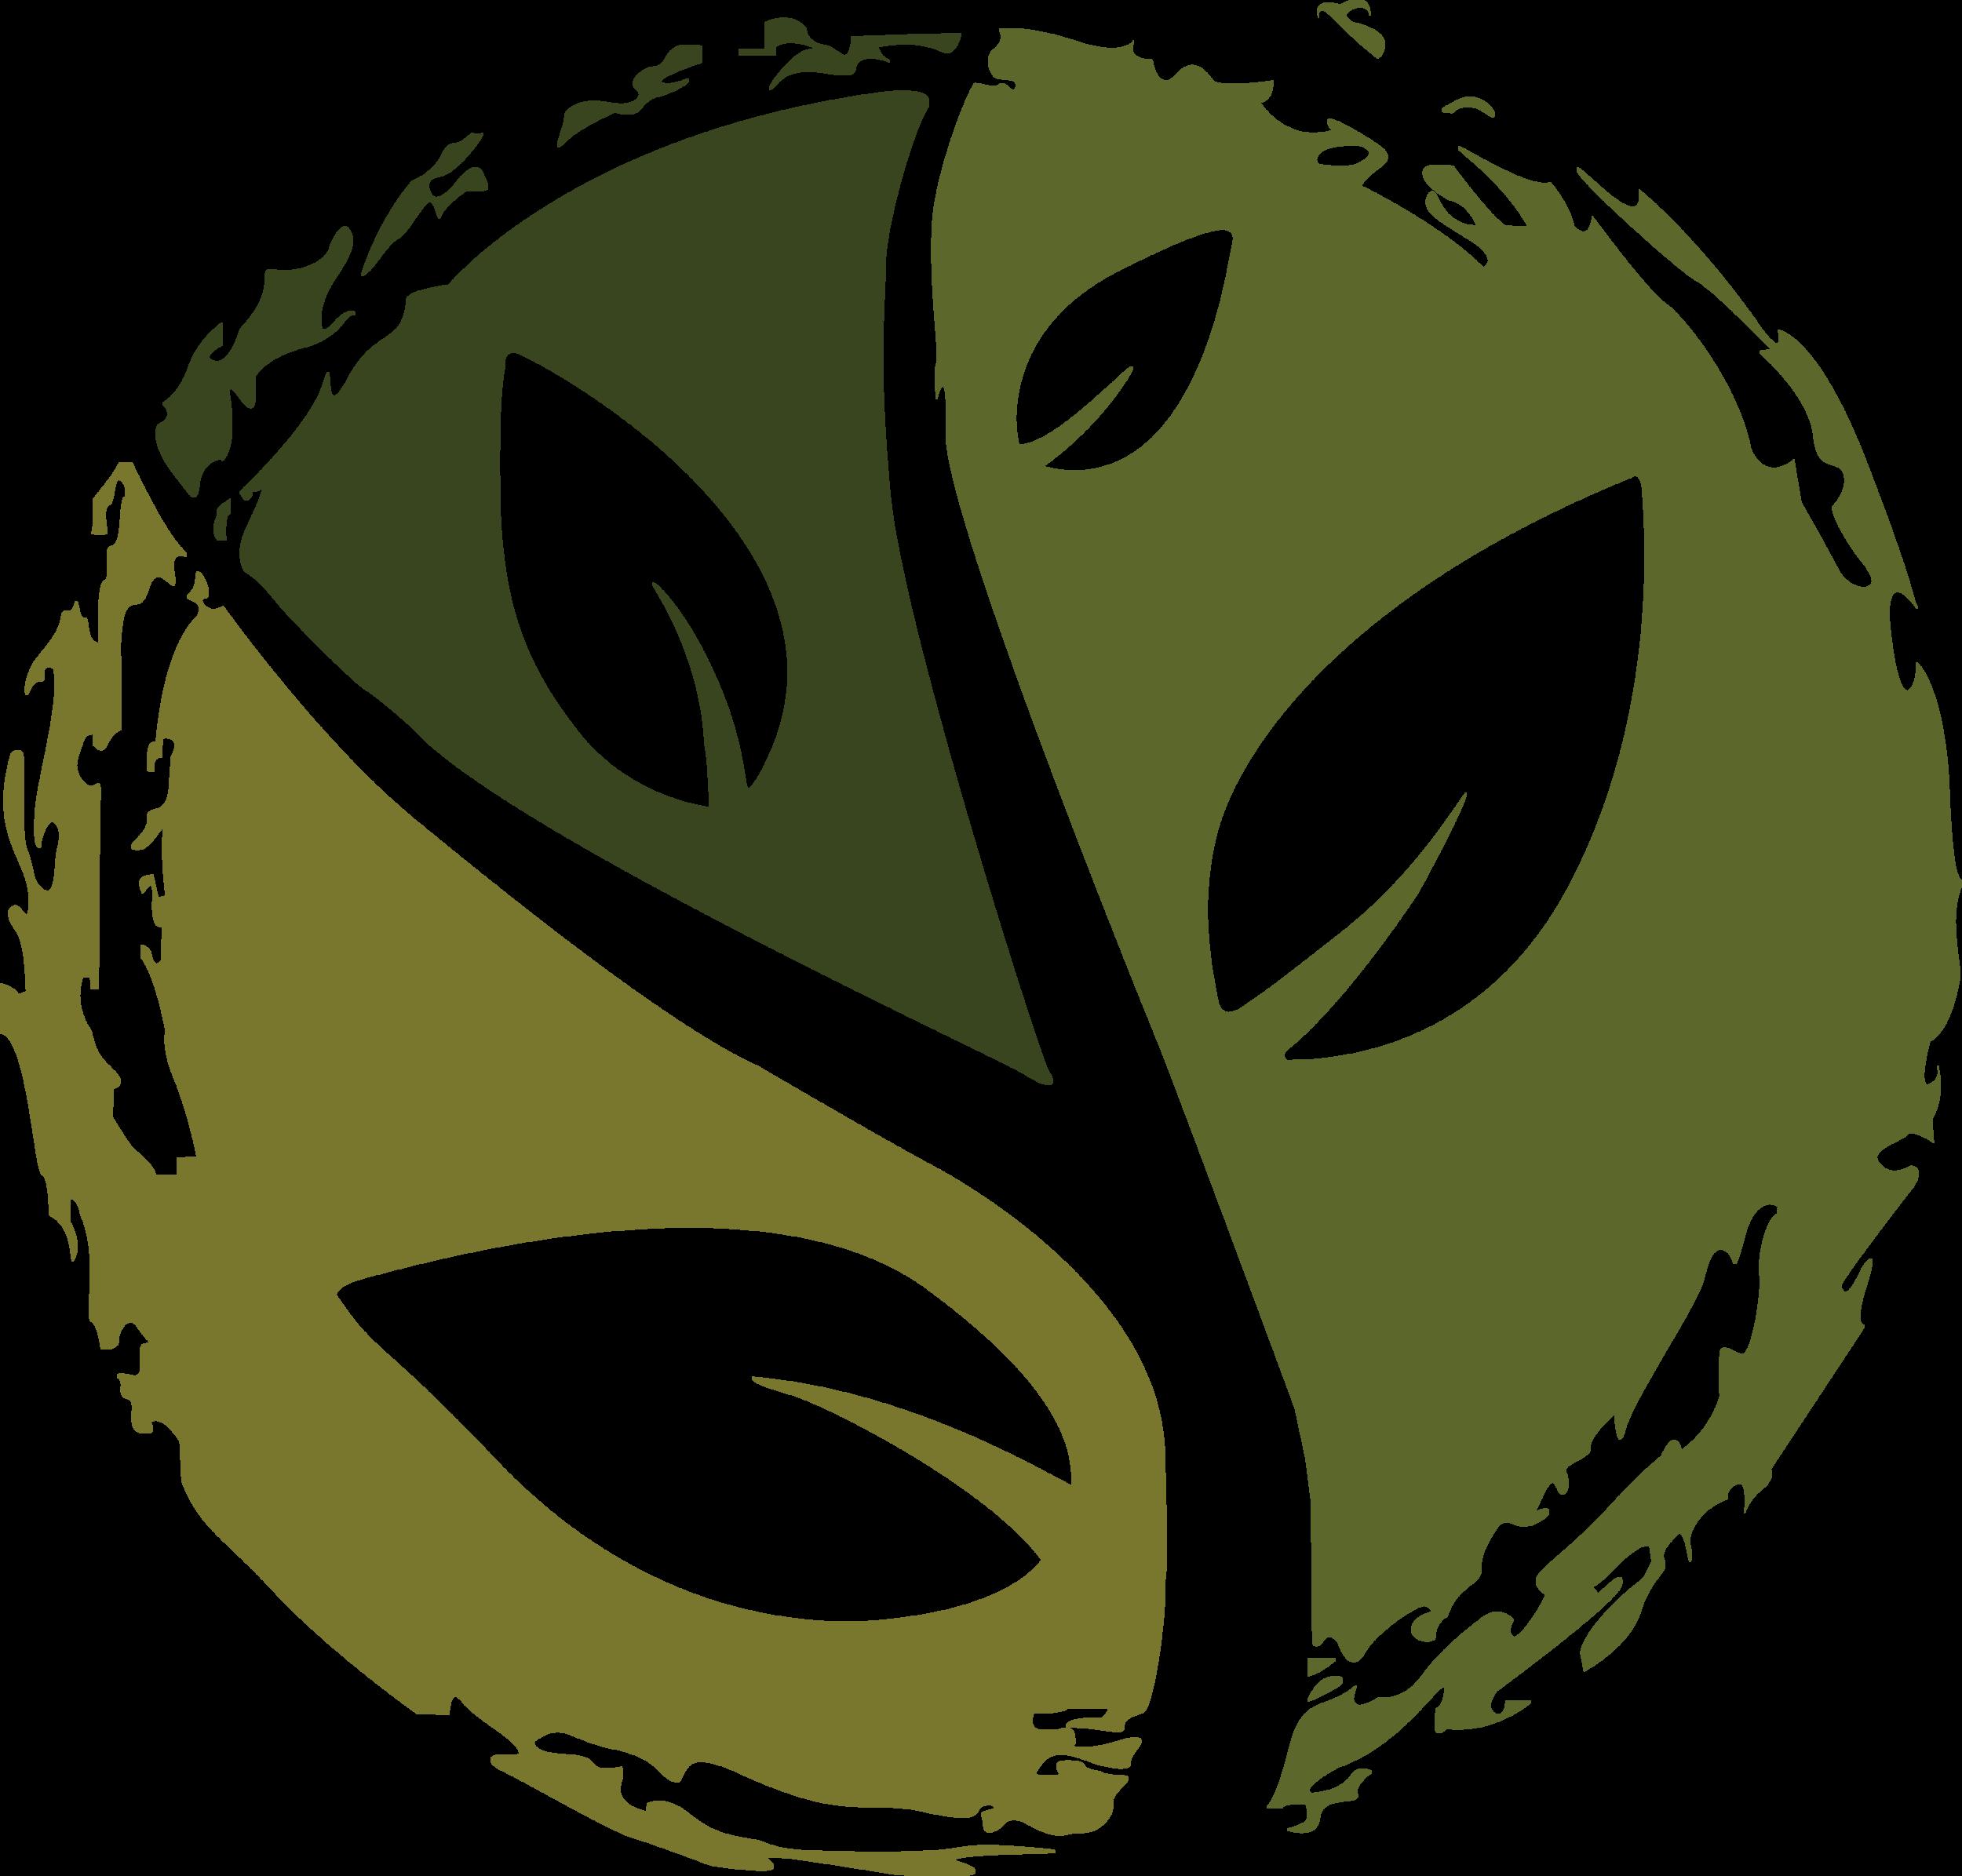 tru-vine-logo-transparent.png